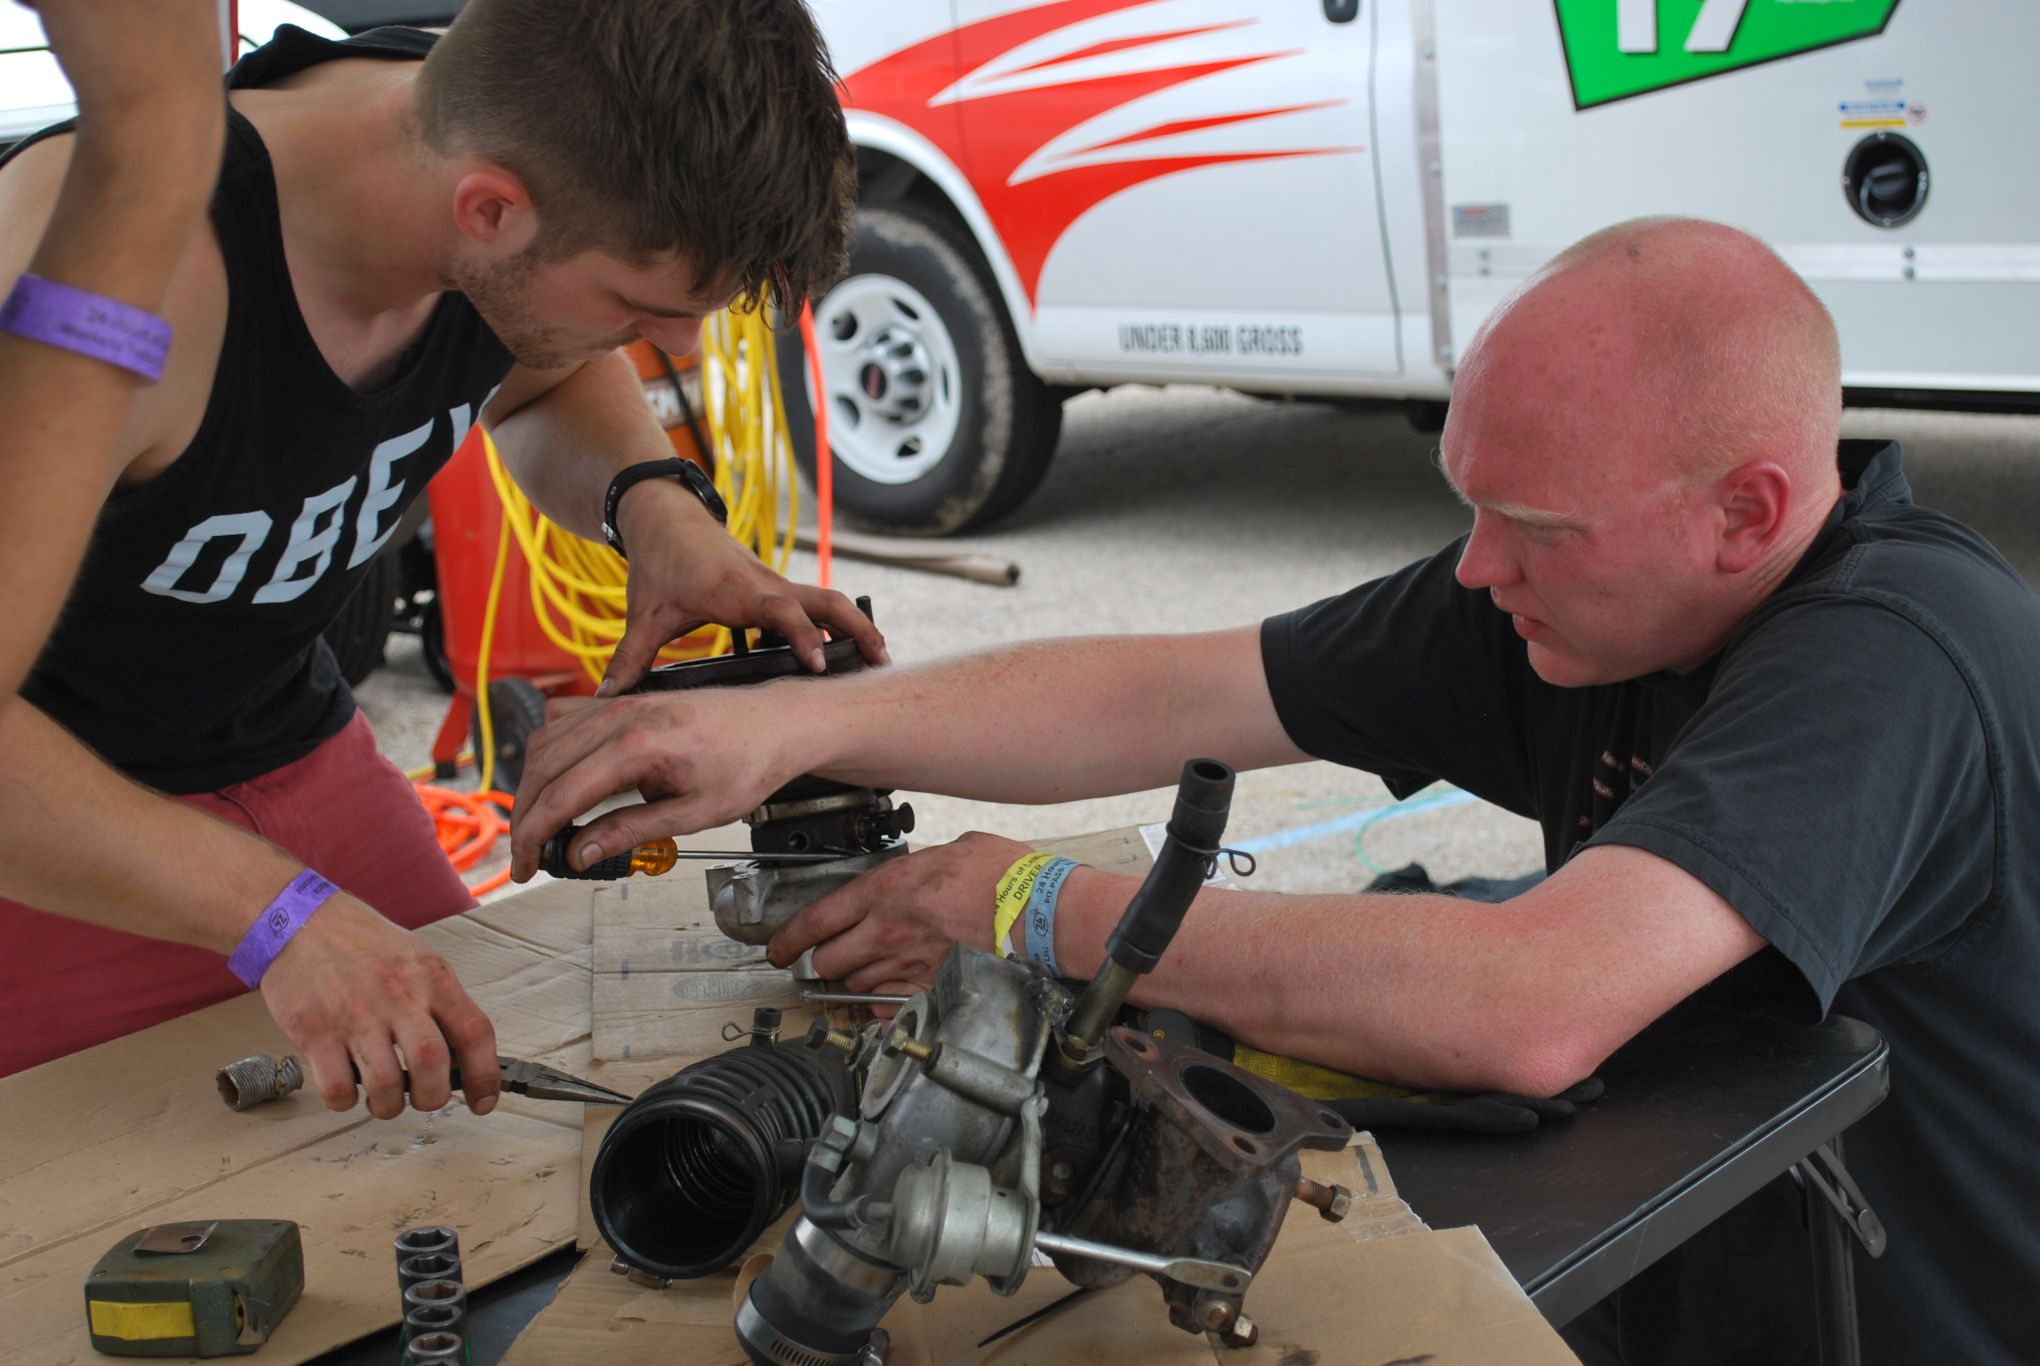 working on Lemons race car in the paddock